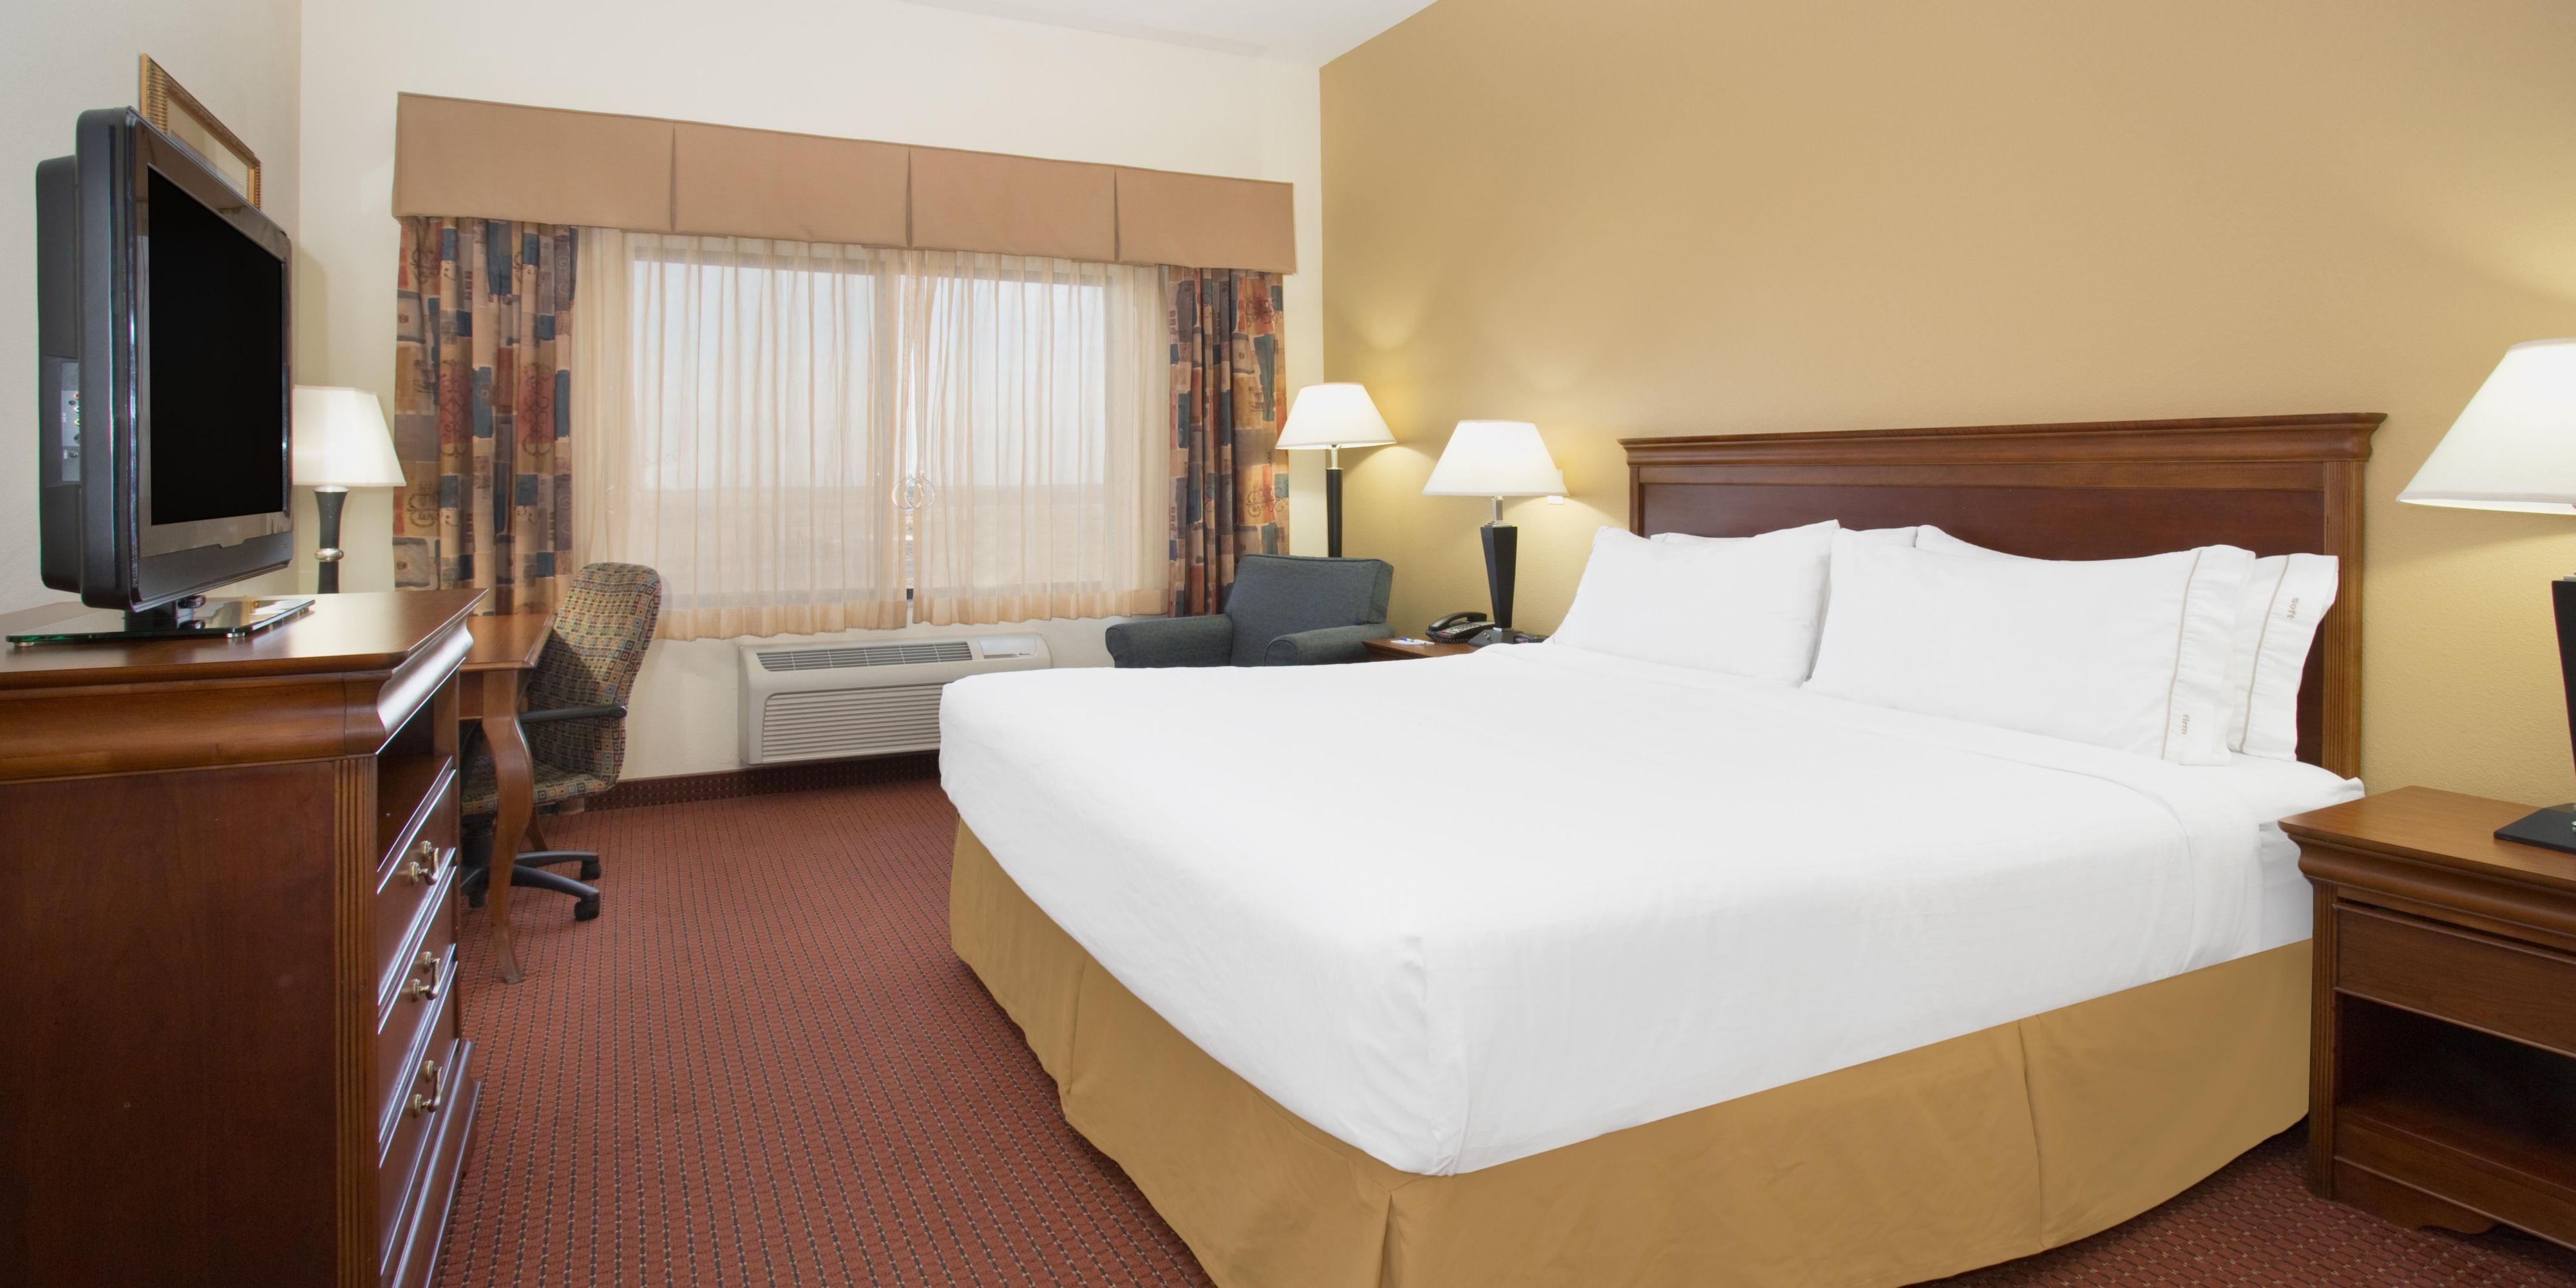 Holiday Inn Express & Suites Las Vegas Hotel by IHG